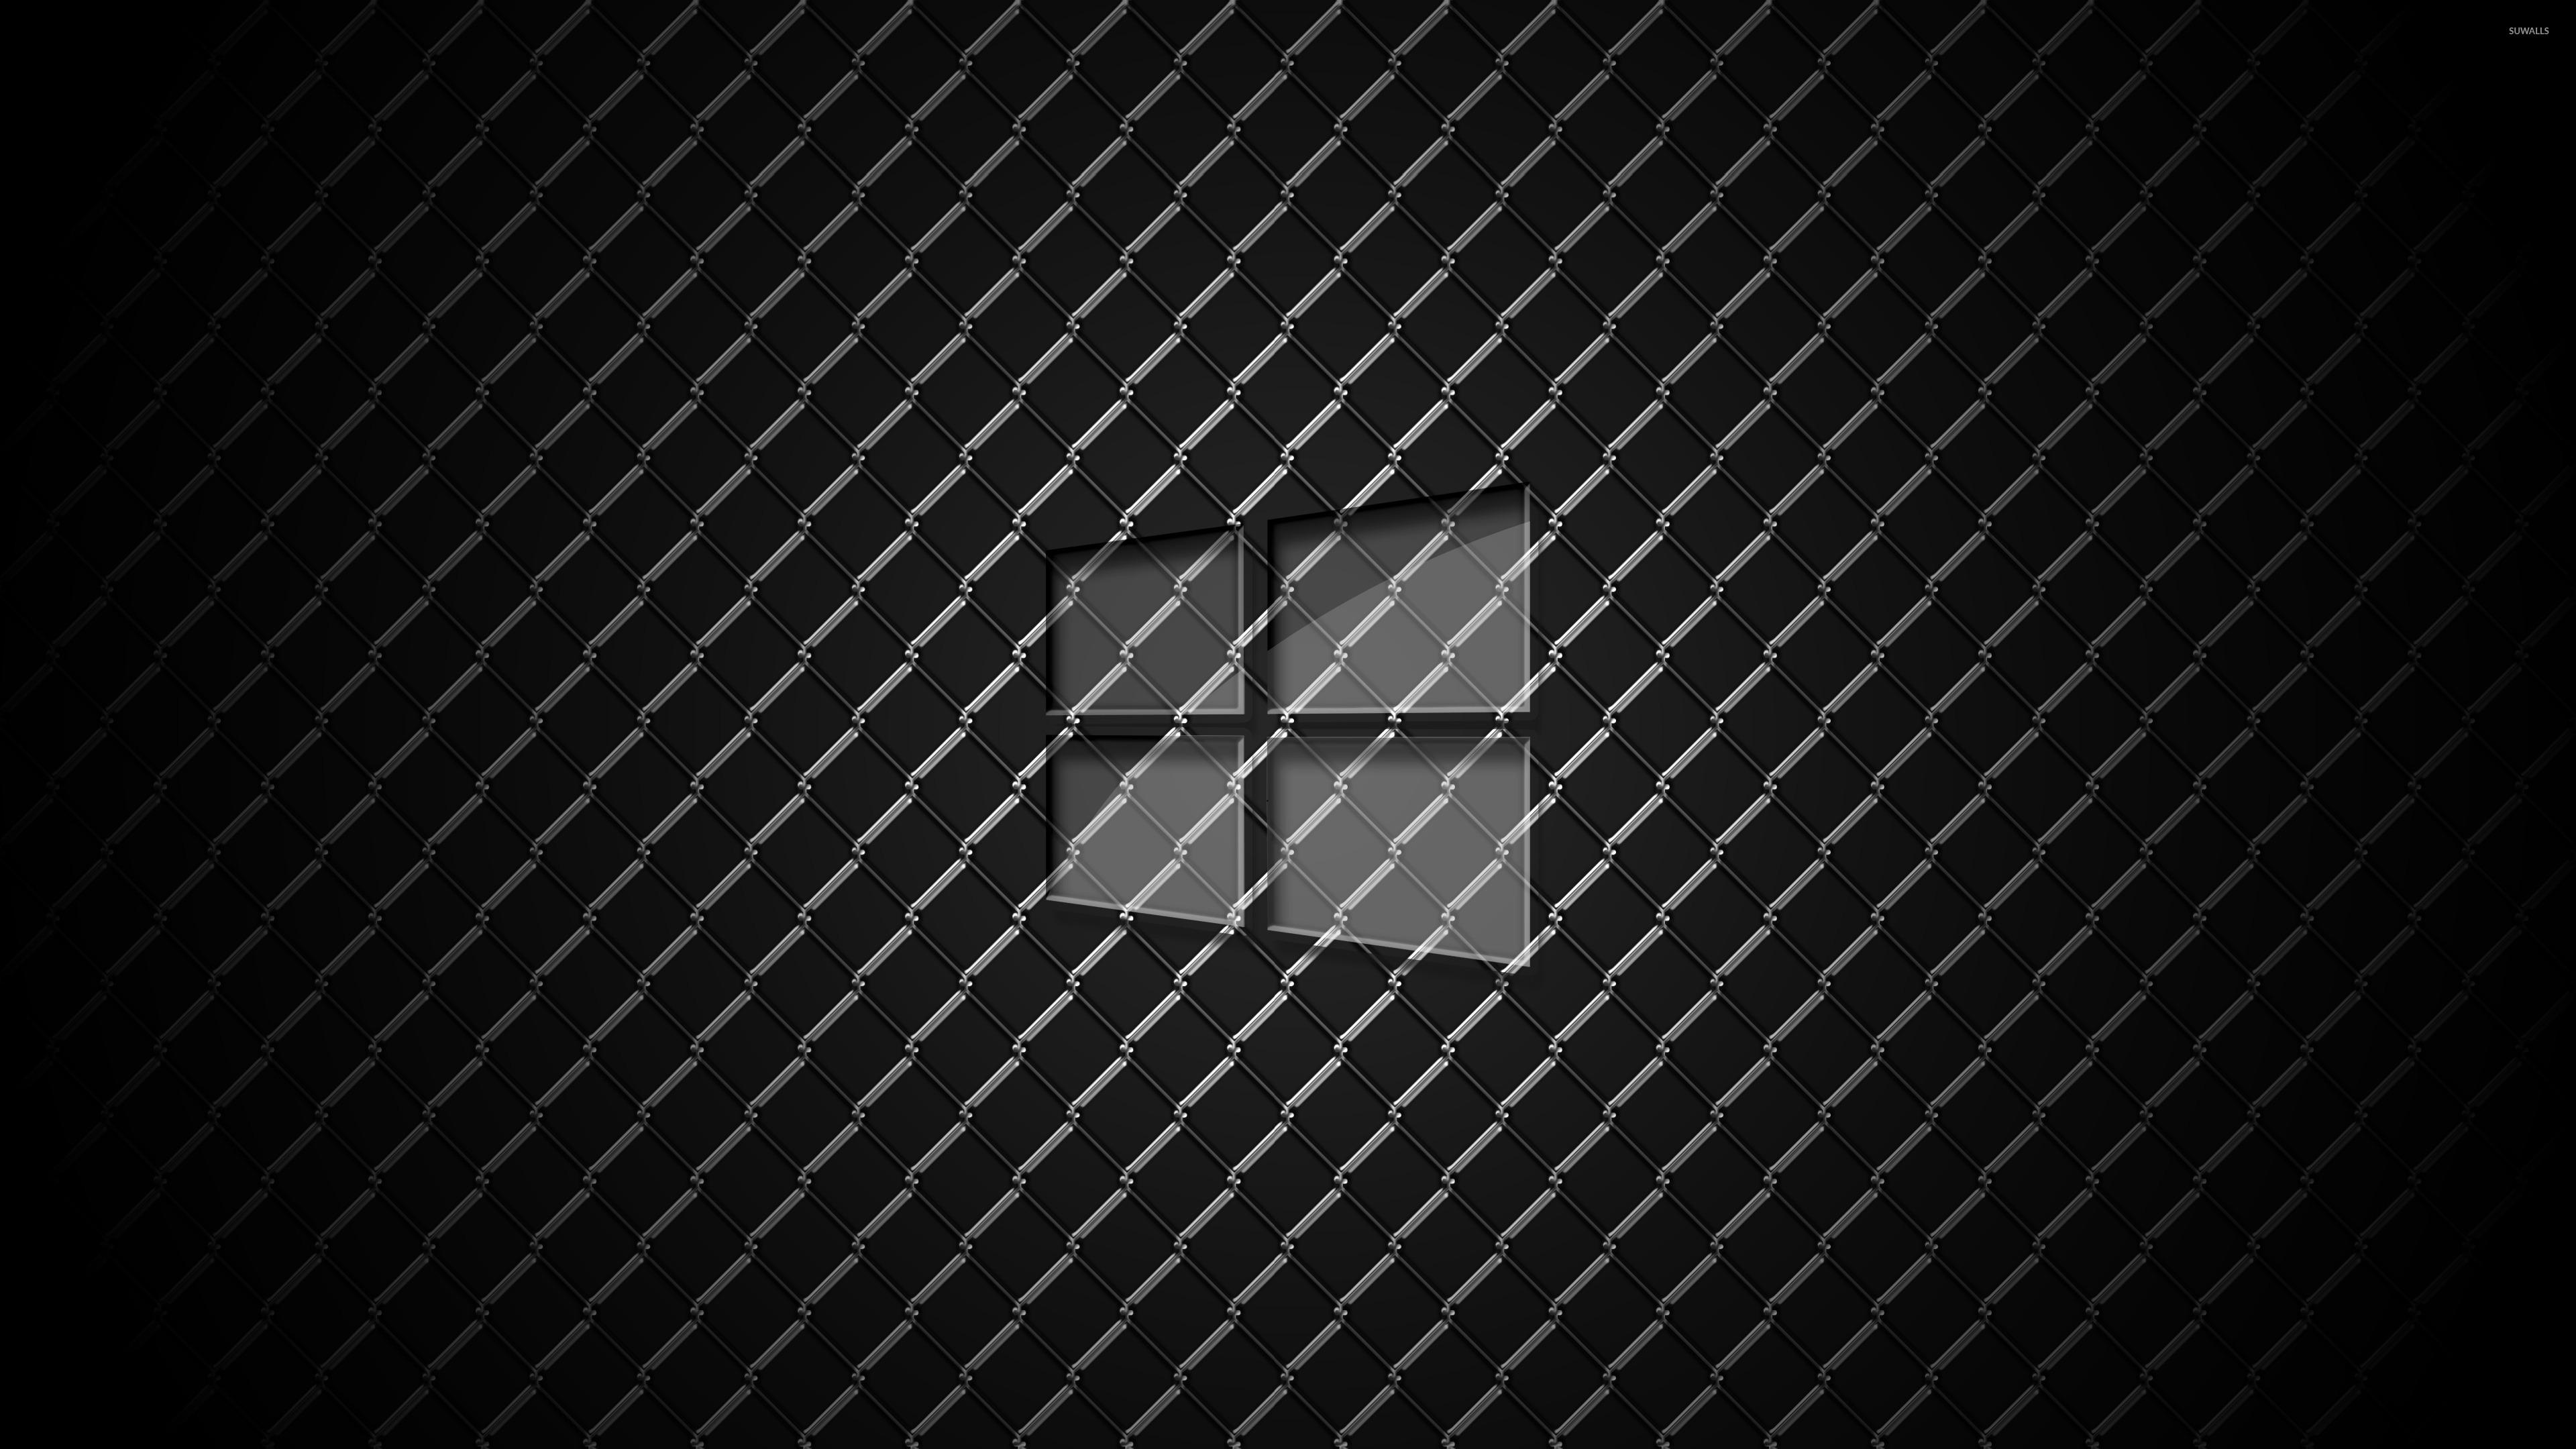 Glass Windows 10 Wallpaper : Glass windows on metal wallpaper computer wallpapers